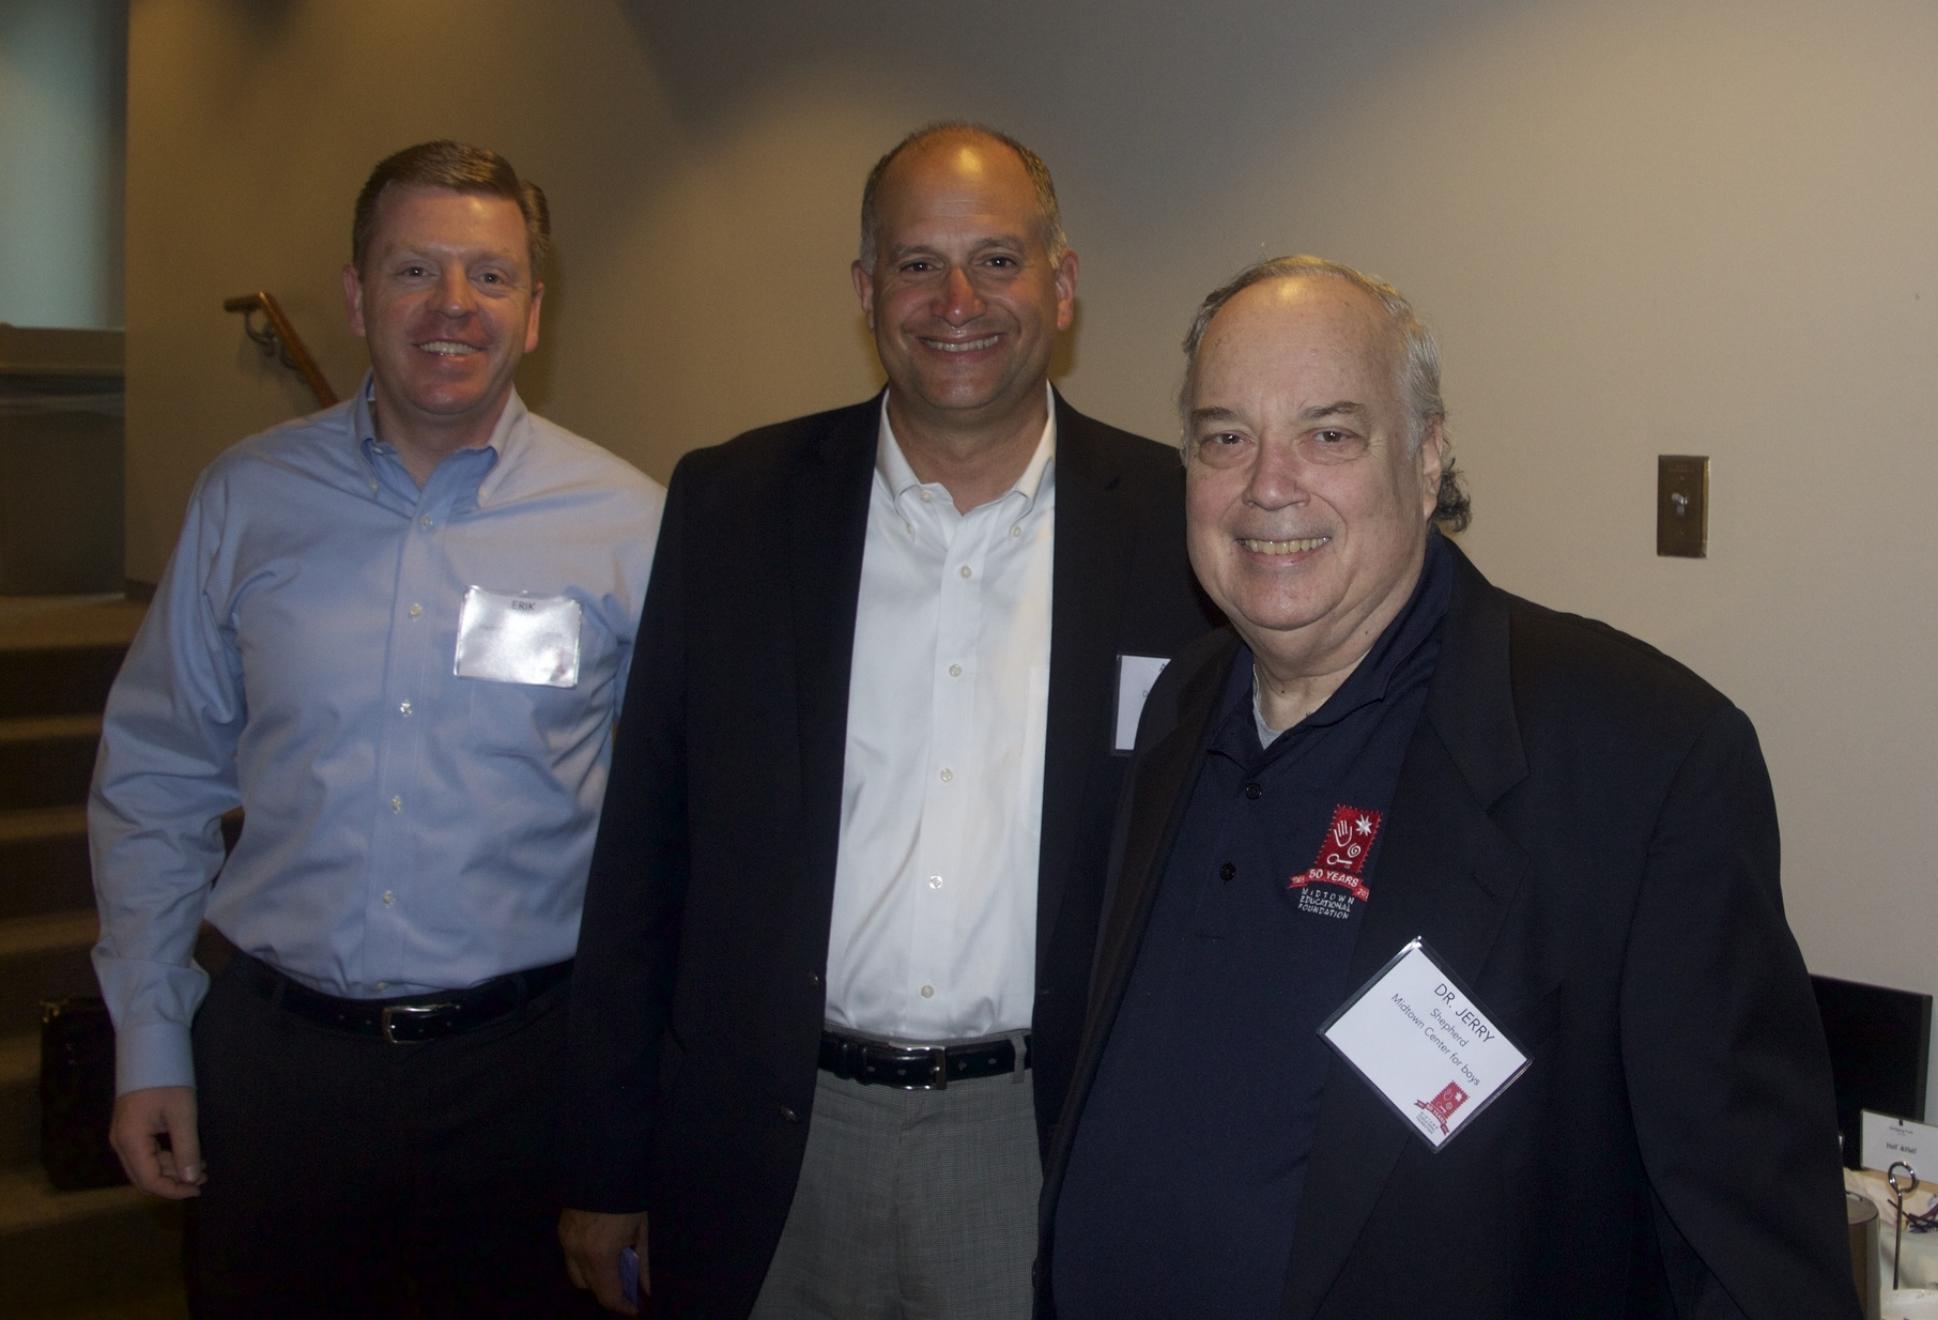 Midtown Advancement Council members Erik Ojala and Andy Clark with Midtown Center Director, Dr. Jerry Shepherd